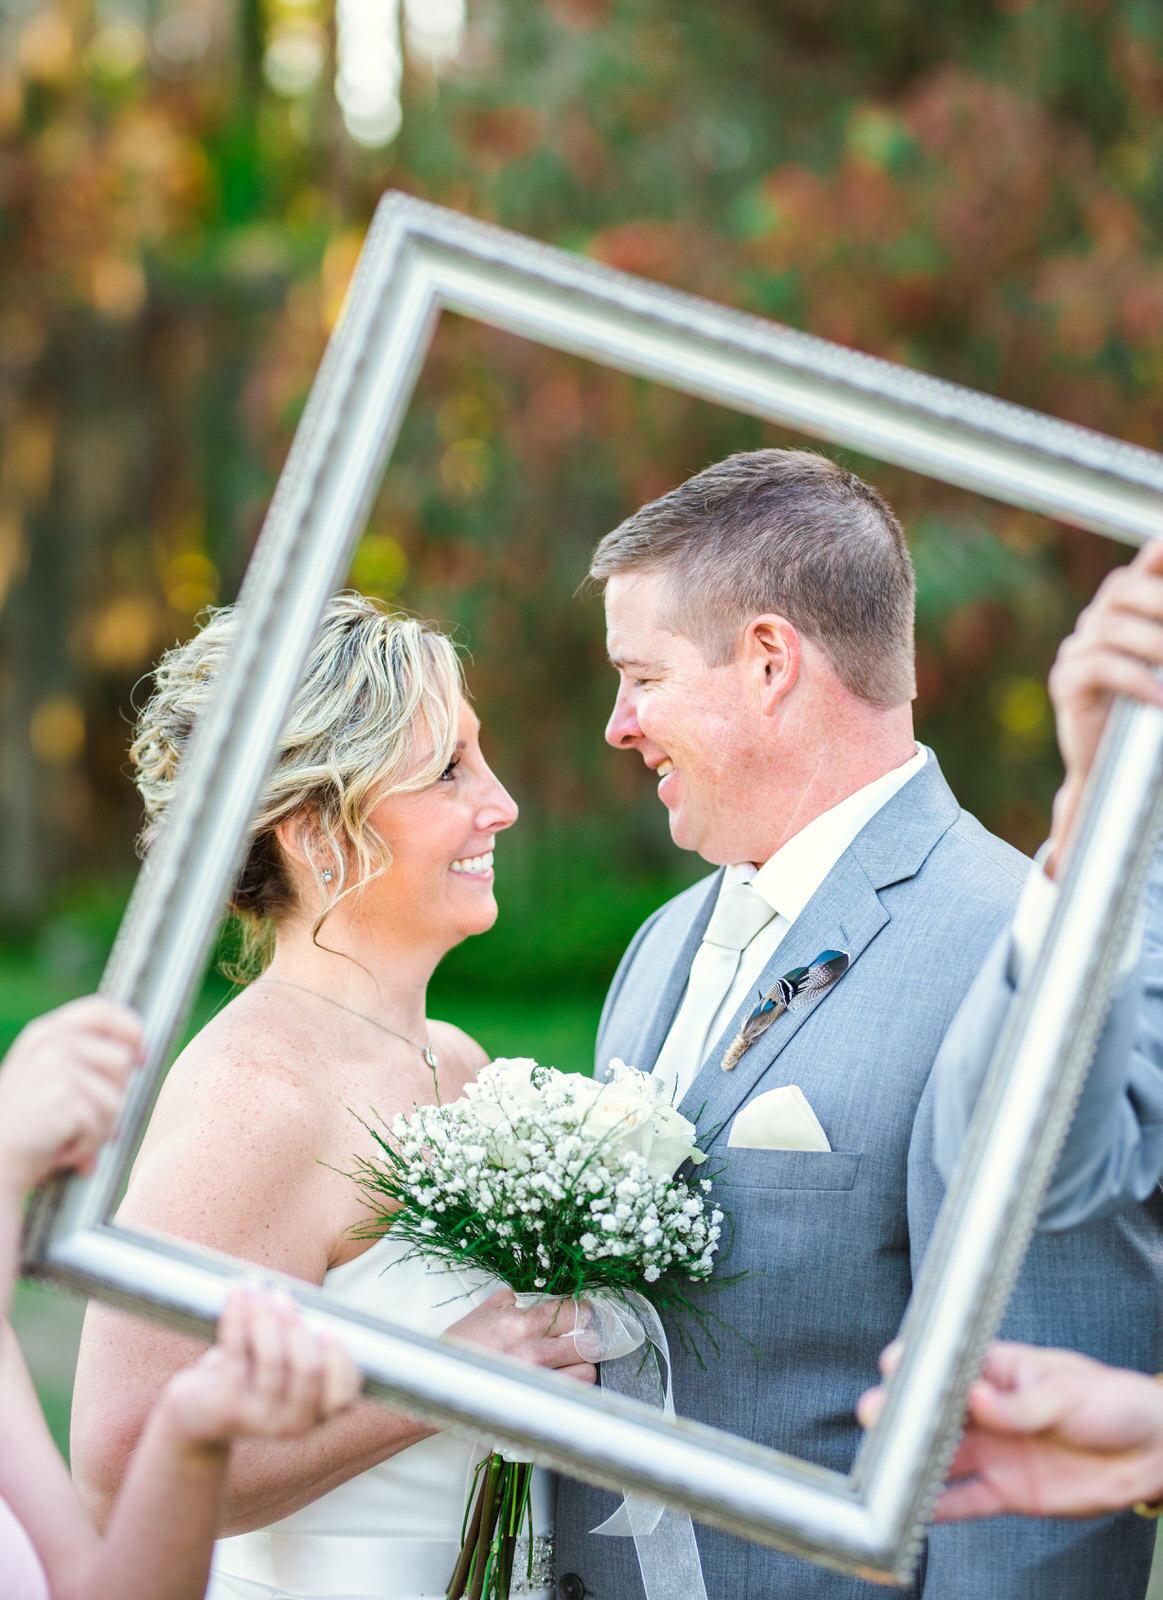 Mike_&_Barbaras_Wedding_3_24_2018-205.jpg